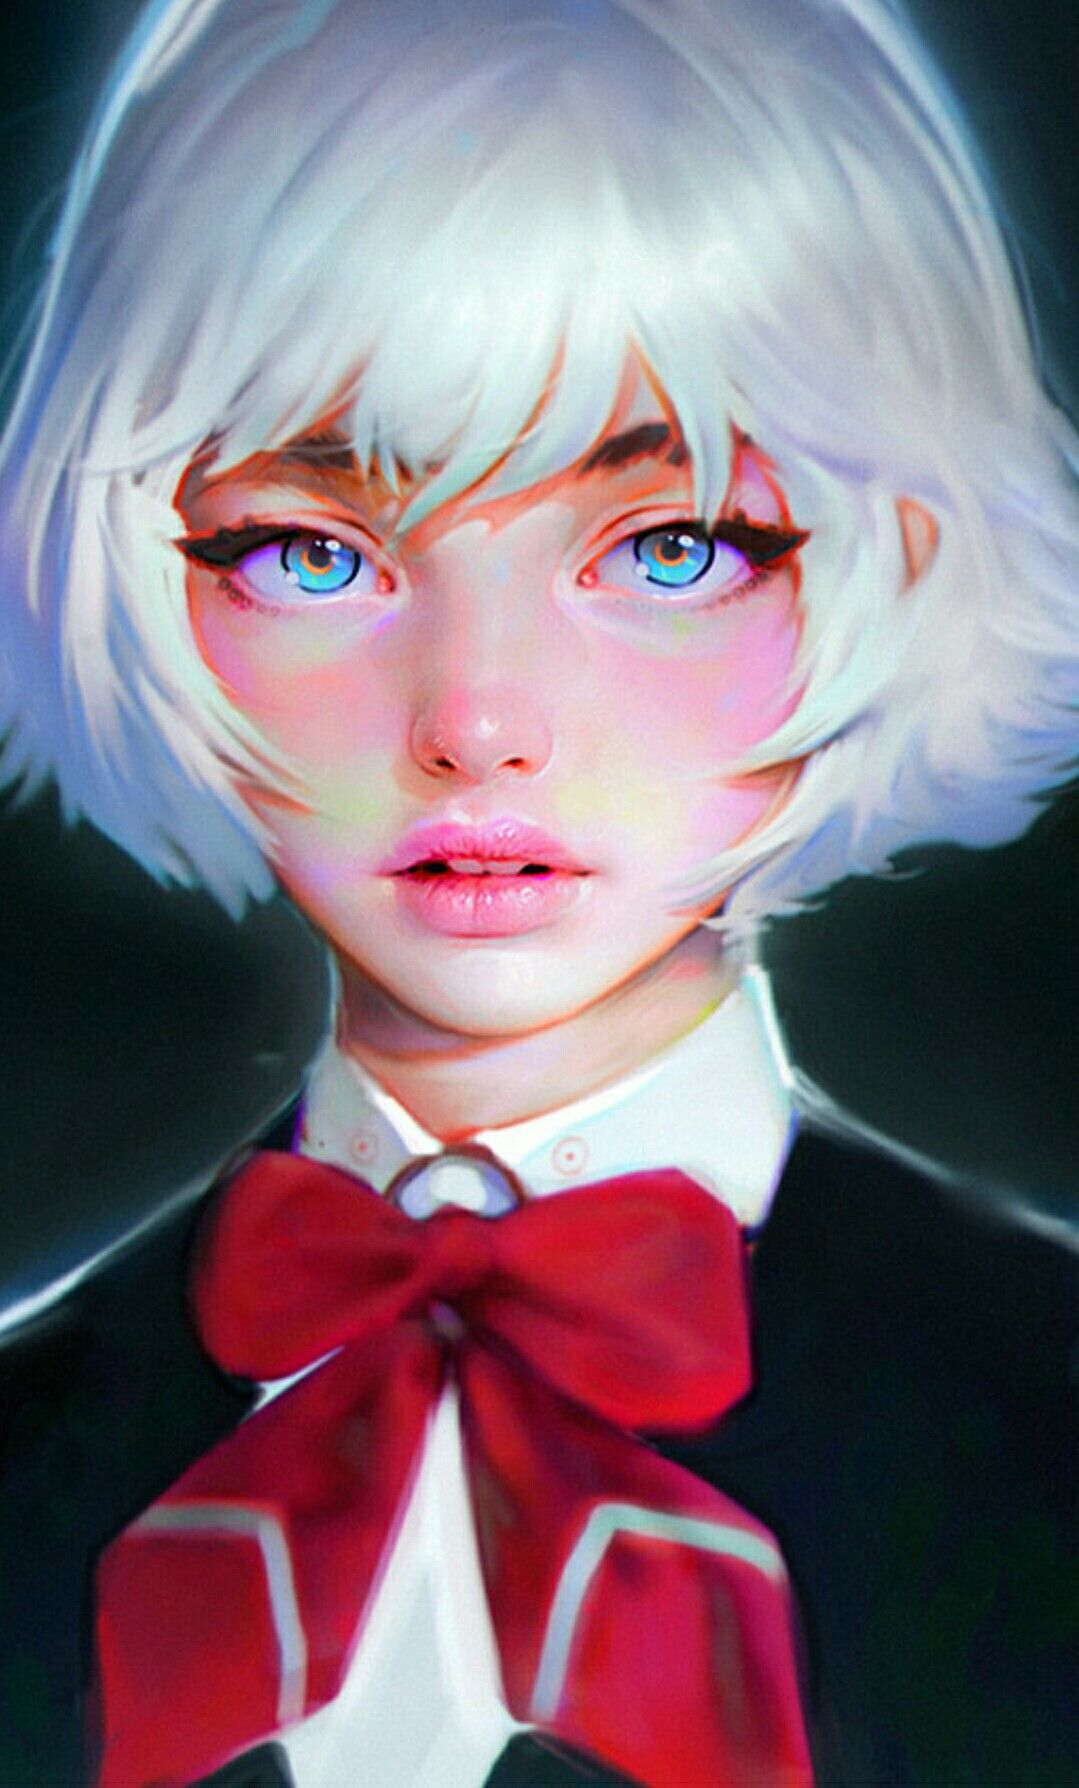 By Irakli Nadar Digital Portrait Digital Painting Portrait Portrait